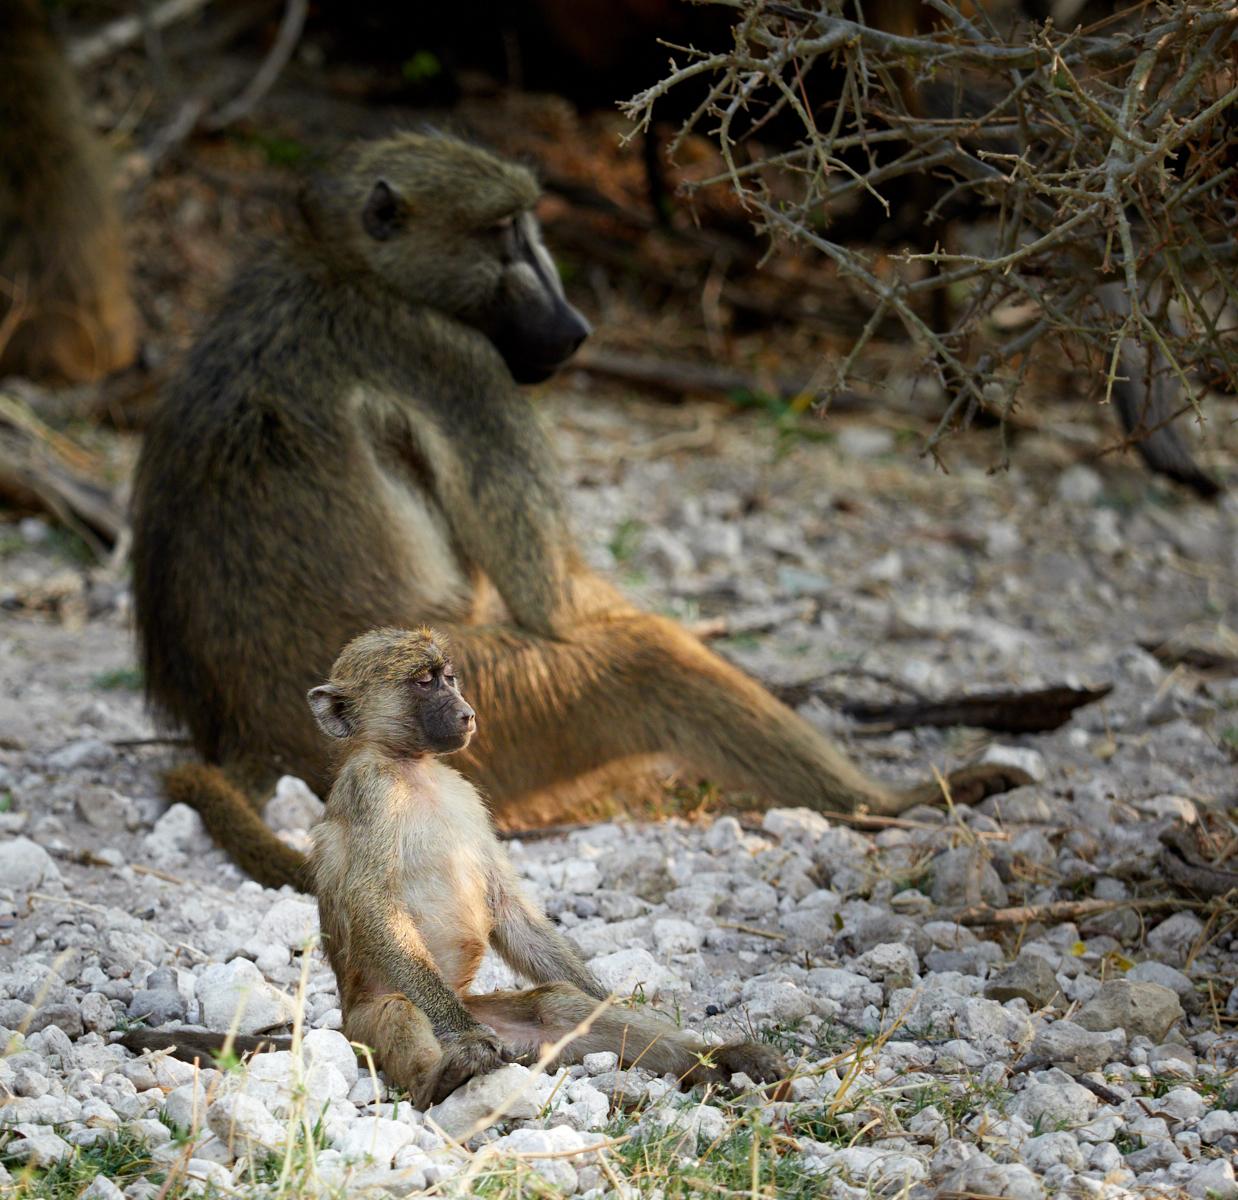 Meditating baby baboon 1600x1200 sRGB.jpg